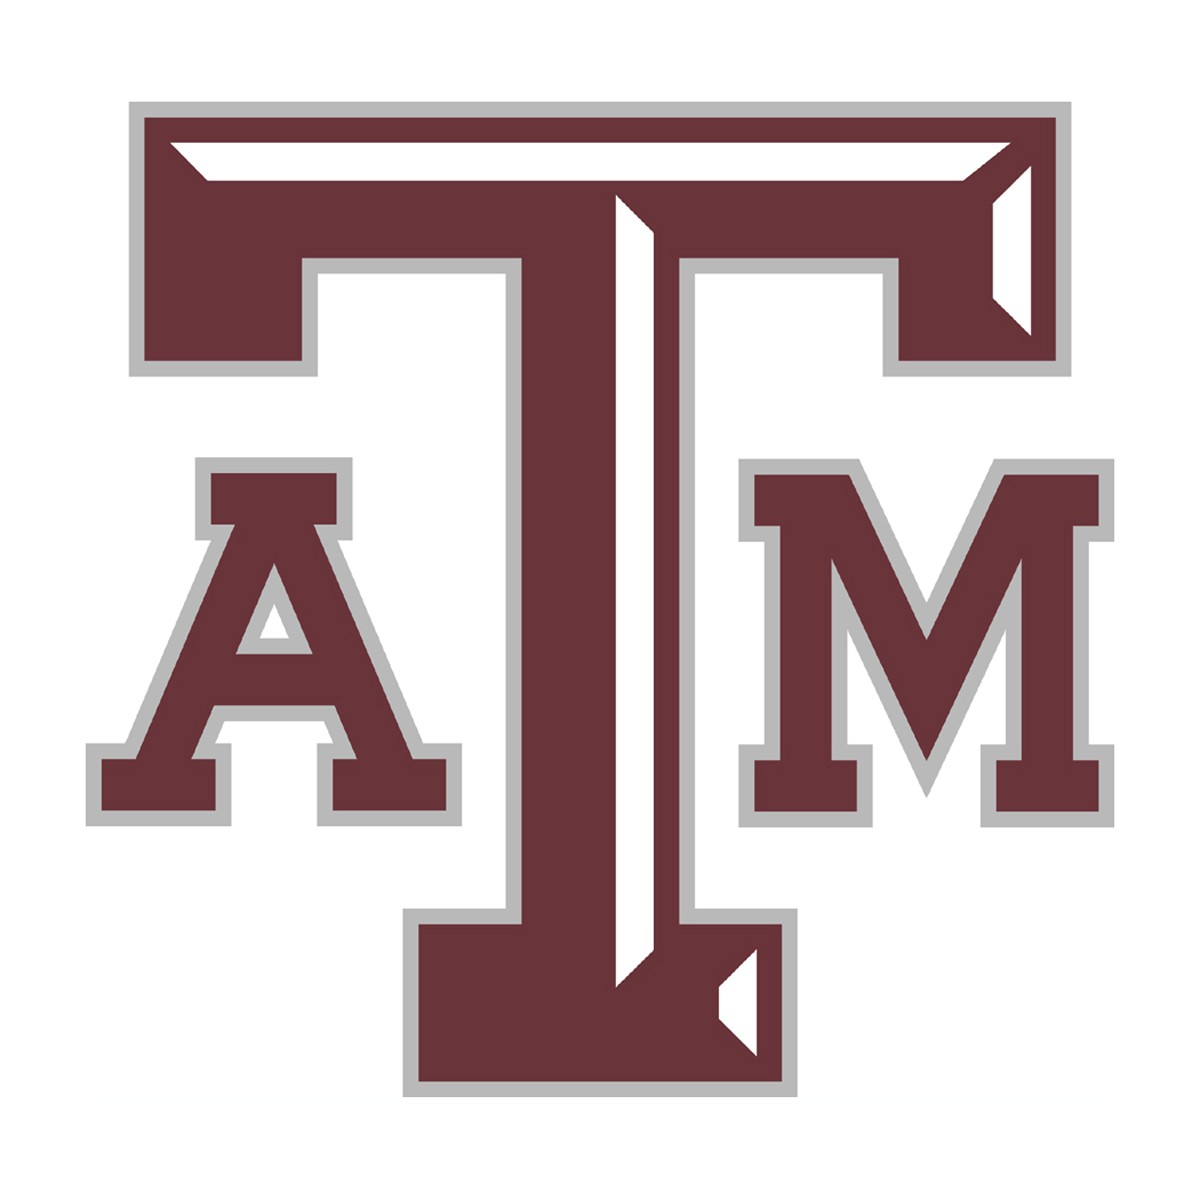 http://4.bp.blogspot.com/_FbQKuXVO4wo/TO5u8yDMvEI/AAAAAAAABak/rlVkhXOL3Yw/s1600/texas+am_logo.jpg